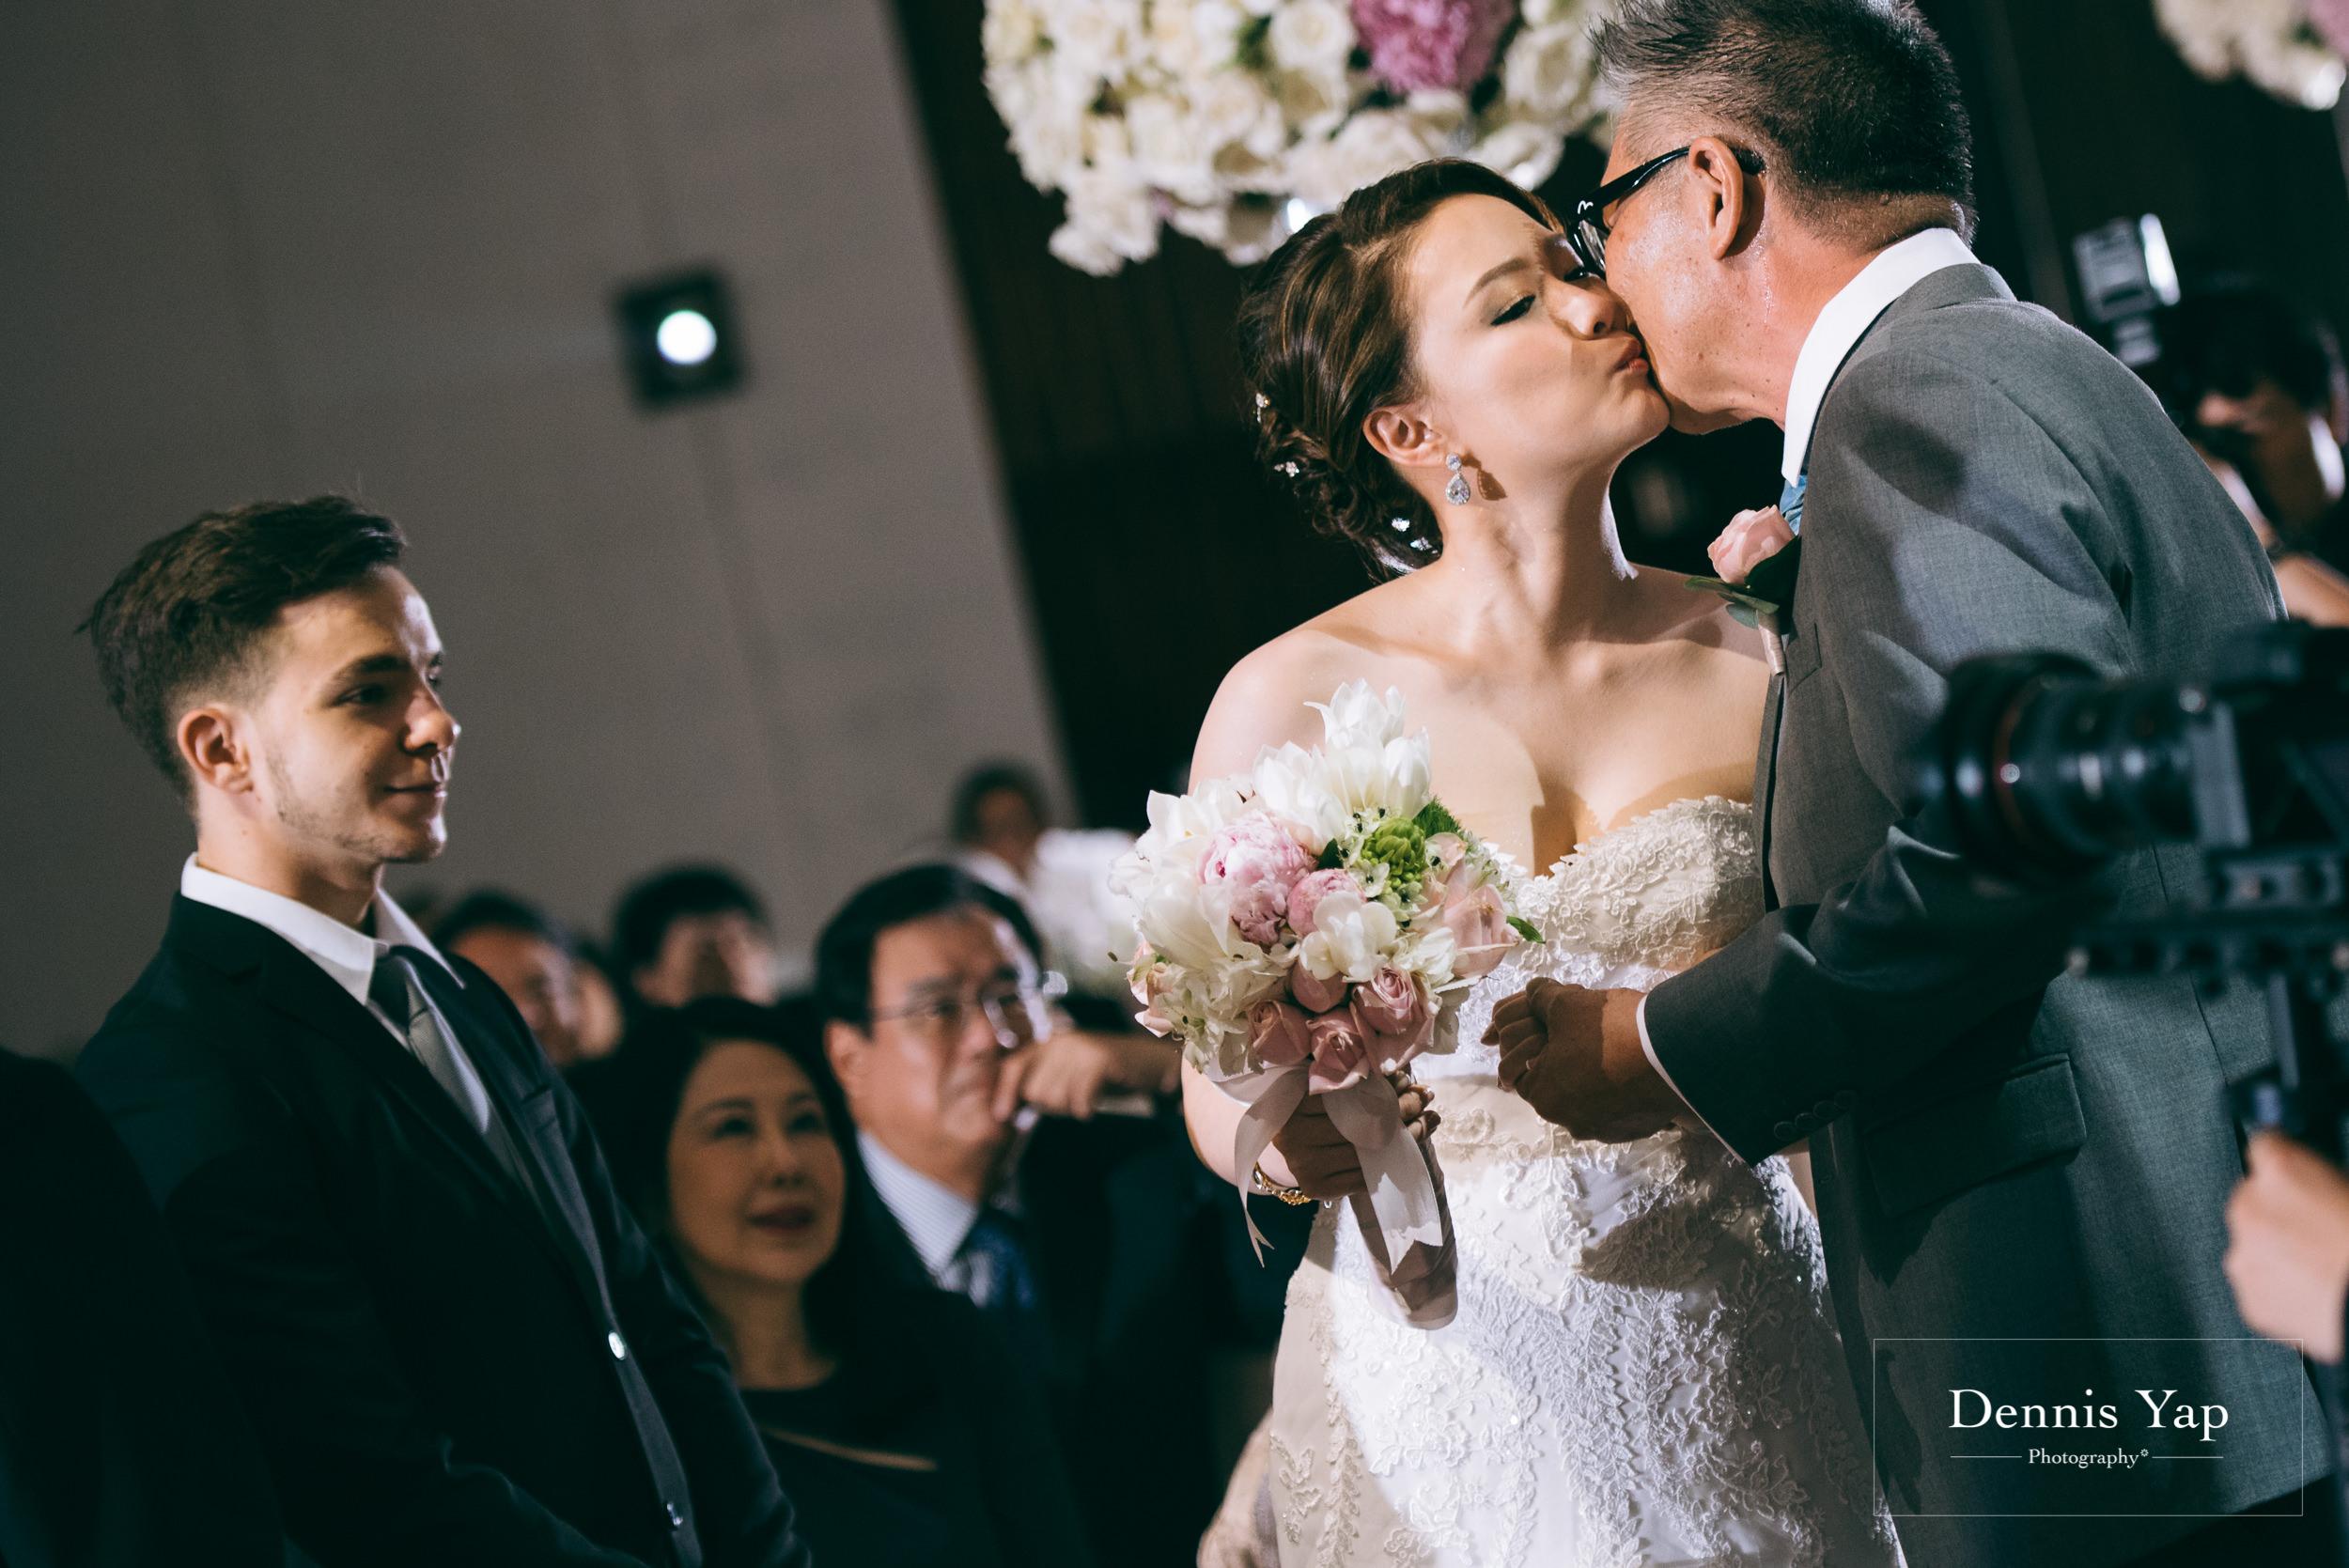 jordan amanda wedding day westin hotel kuala lumpur choe family dennis yap photography-25.jpg